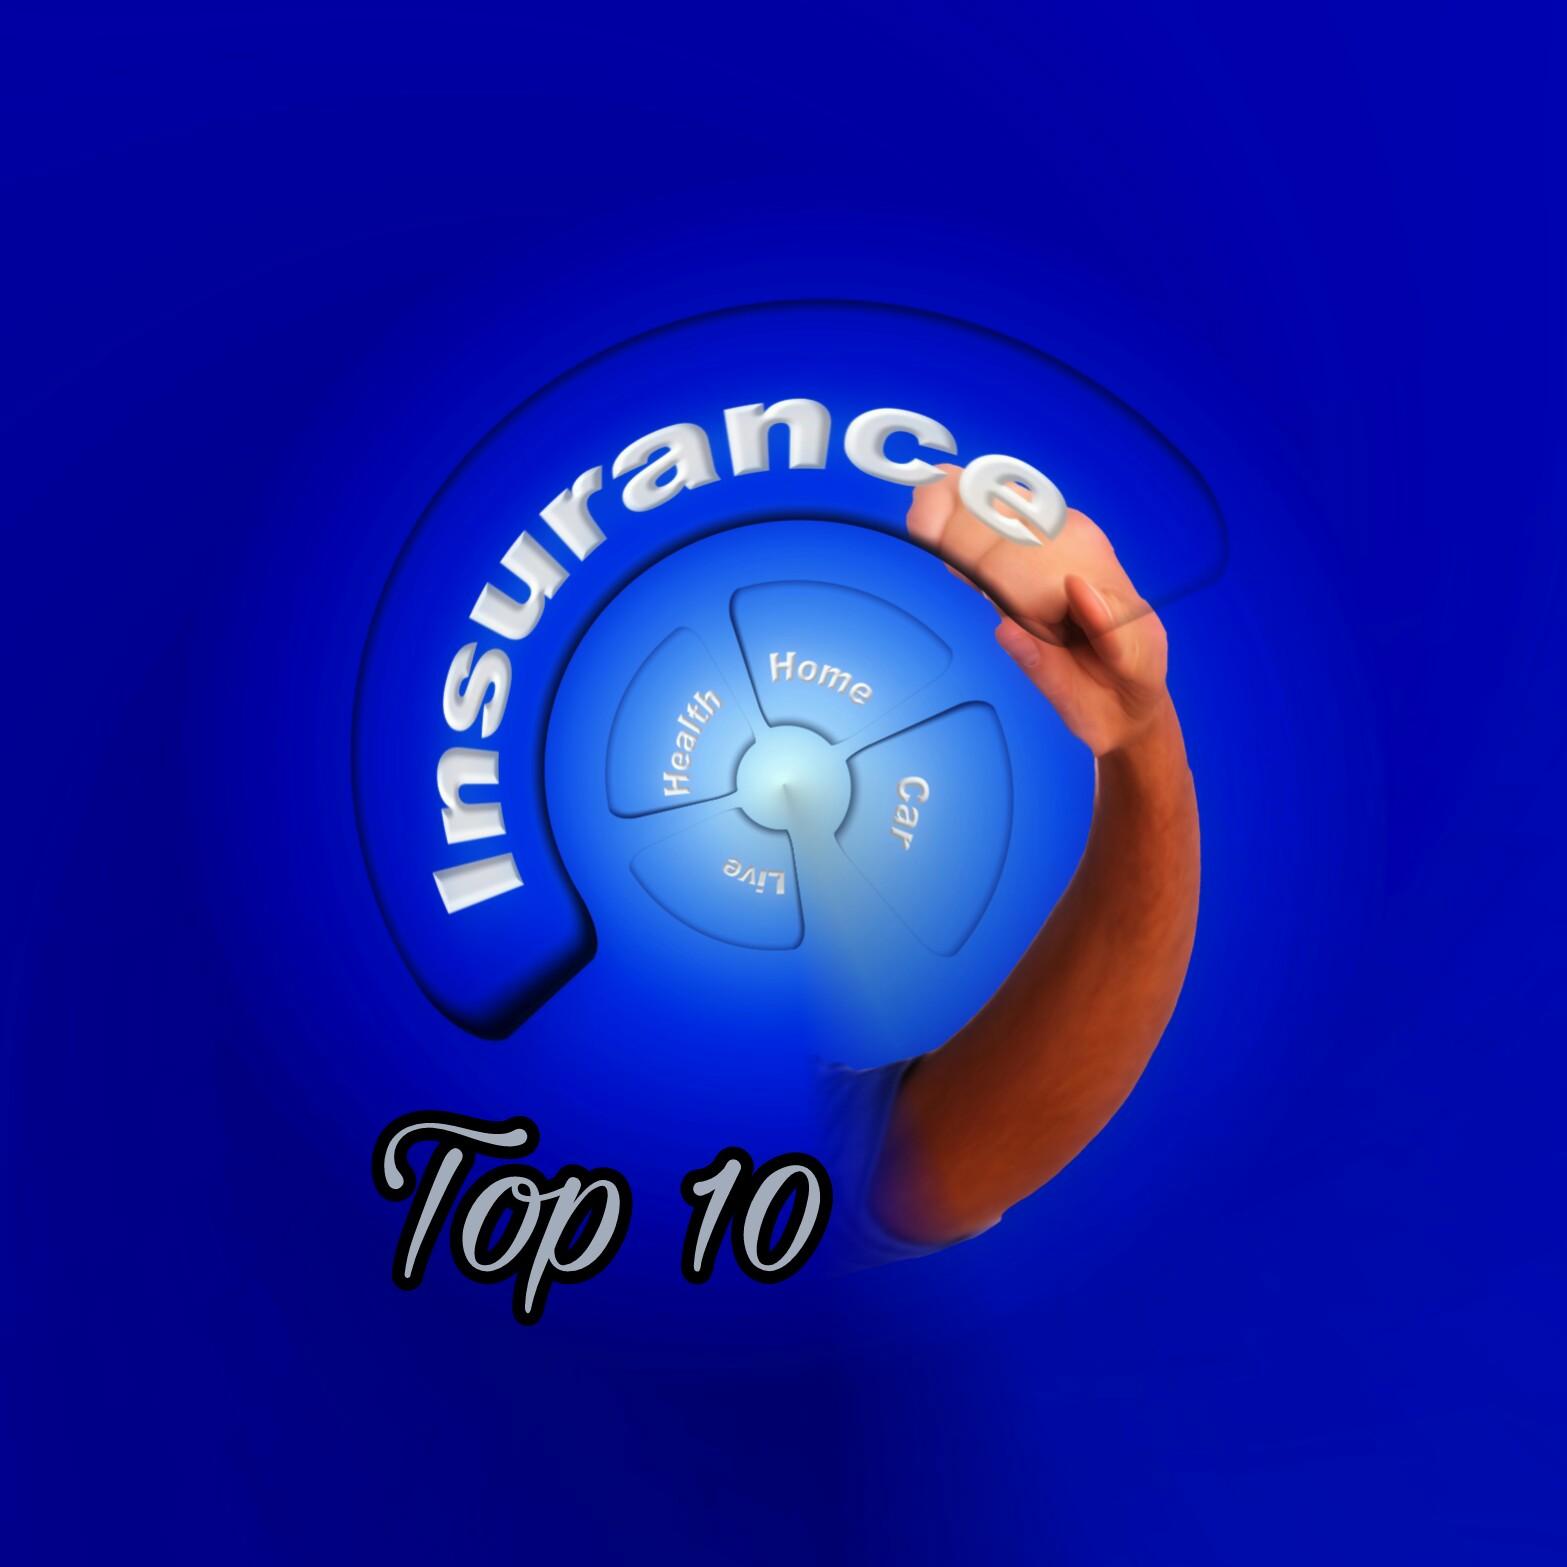 Top 10 Insurance Companies In India Hindi क न क नस ह